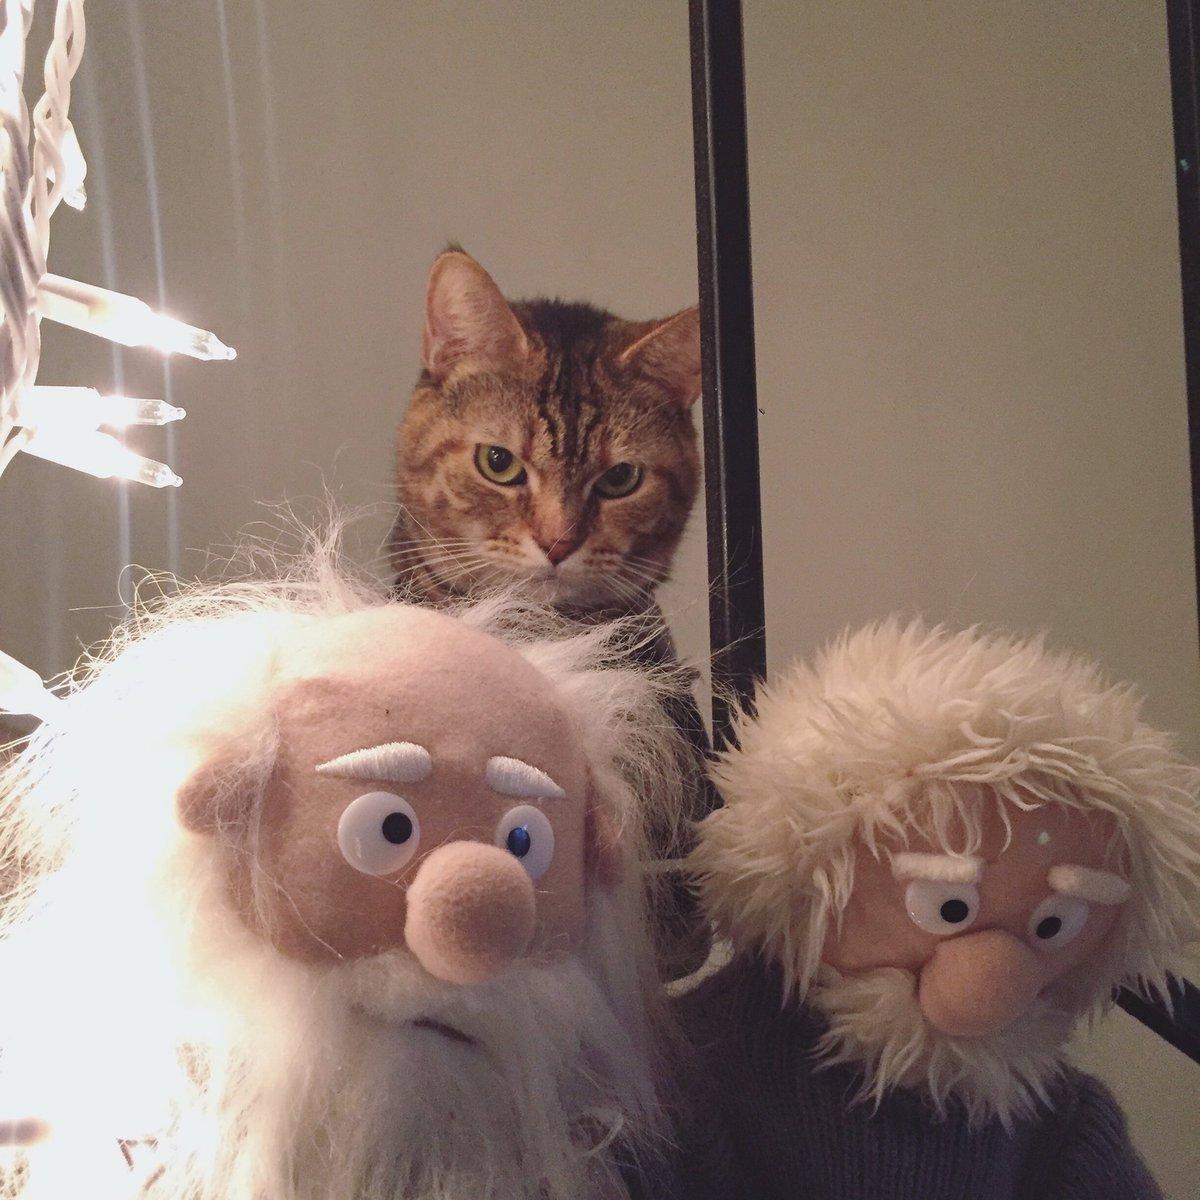 A meeting of geniuses: Charles Darwin, Albert Einstein,....Eliza Cat  #cat #CatsOfTwitter <br>http://pic.twitter.com/HX8eFqHPJL